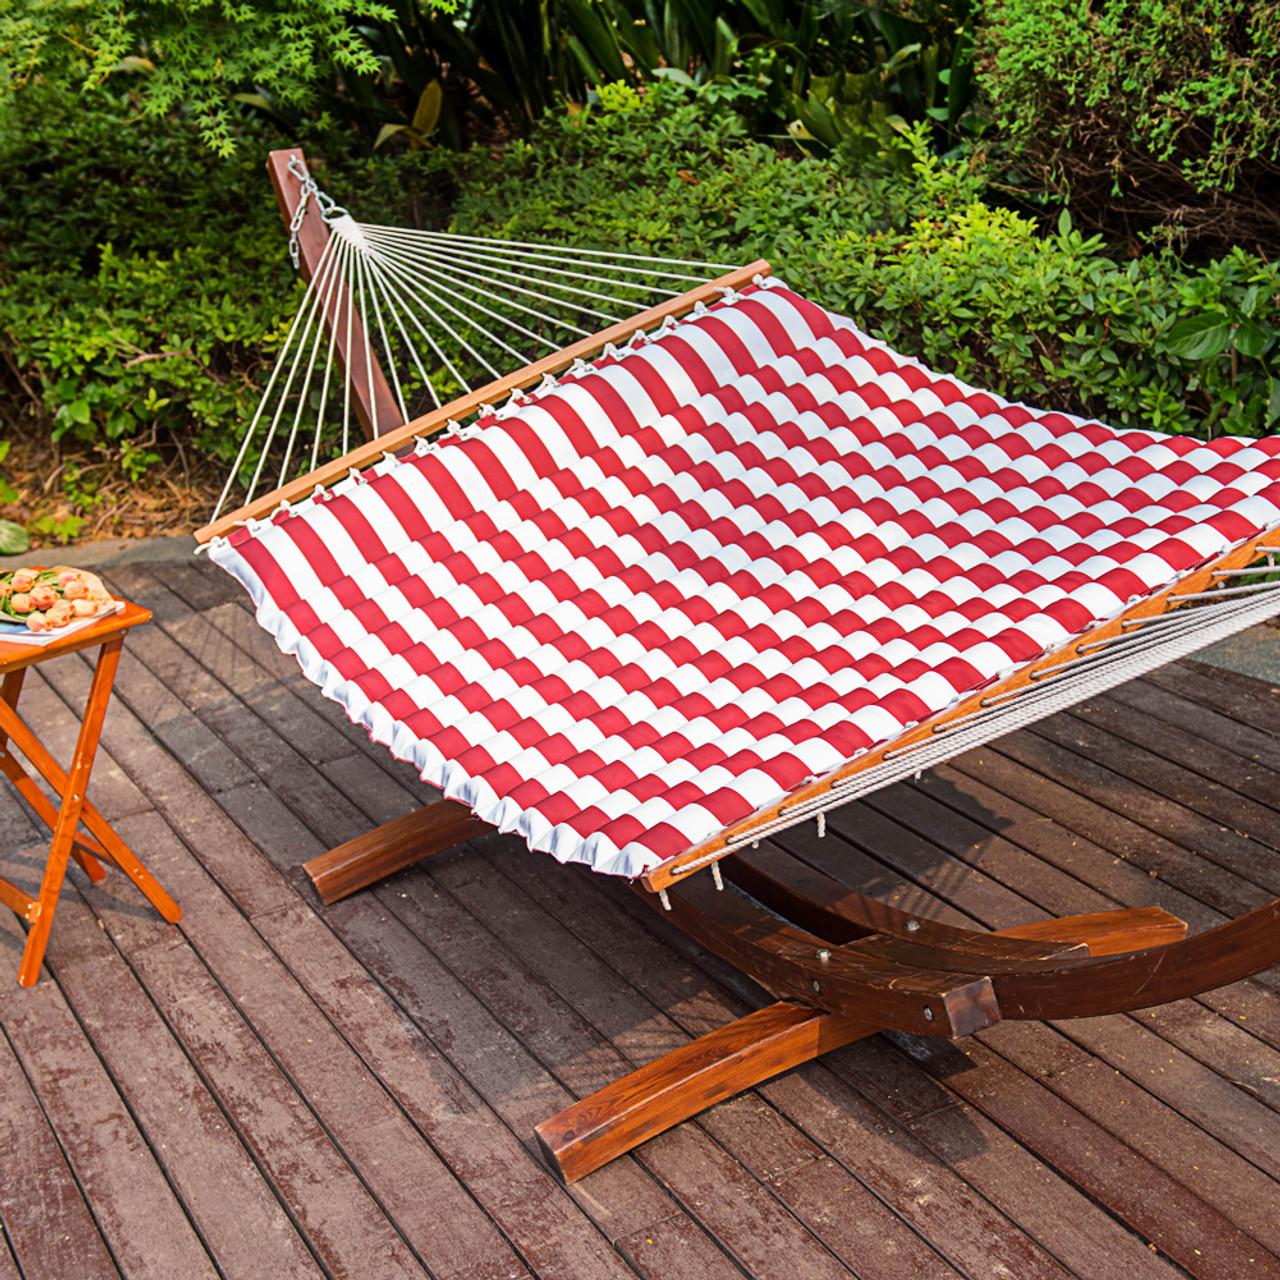 lazy daze hammocks double size pillow top hammock spreader bar heavy duty  sienna  lazydaze hammocks double size pillow top hammock spreader bar      rh   sundaleoutdoor